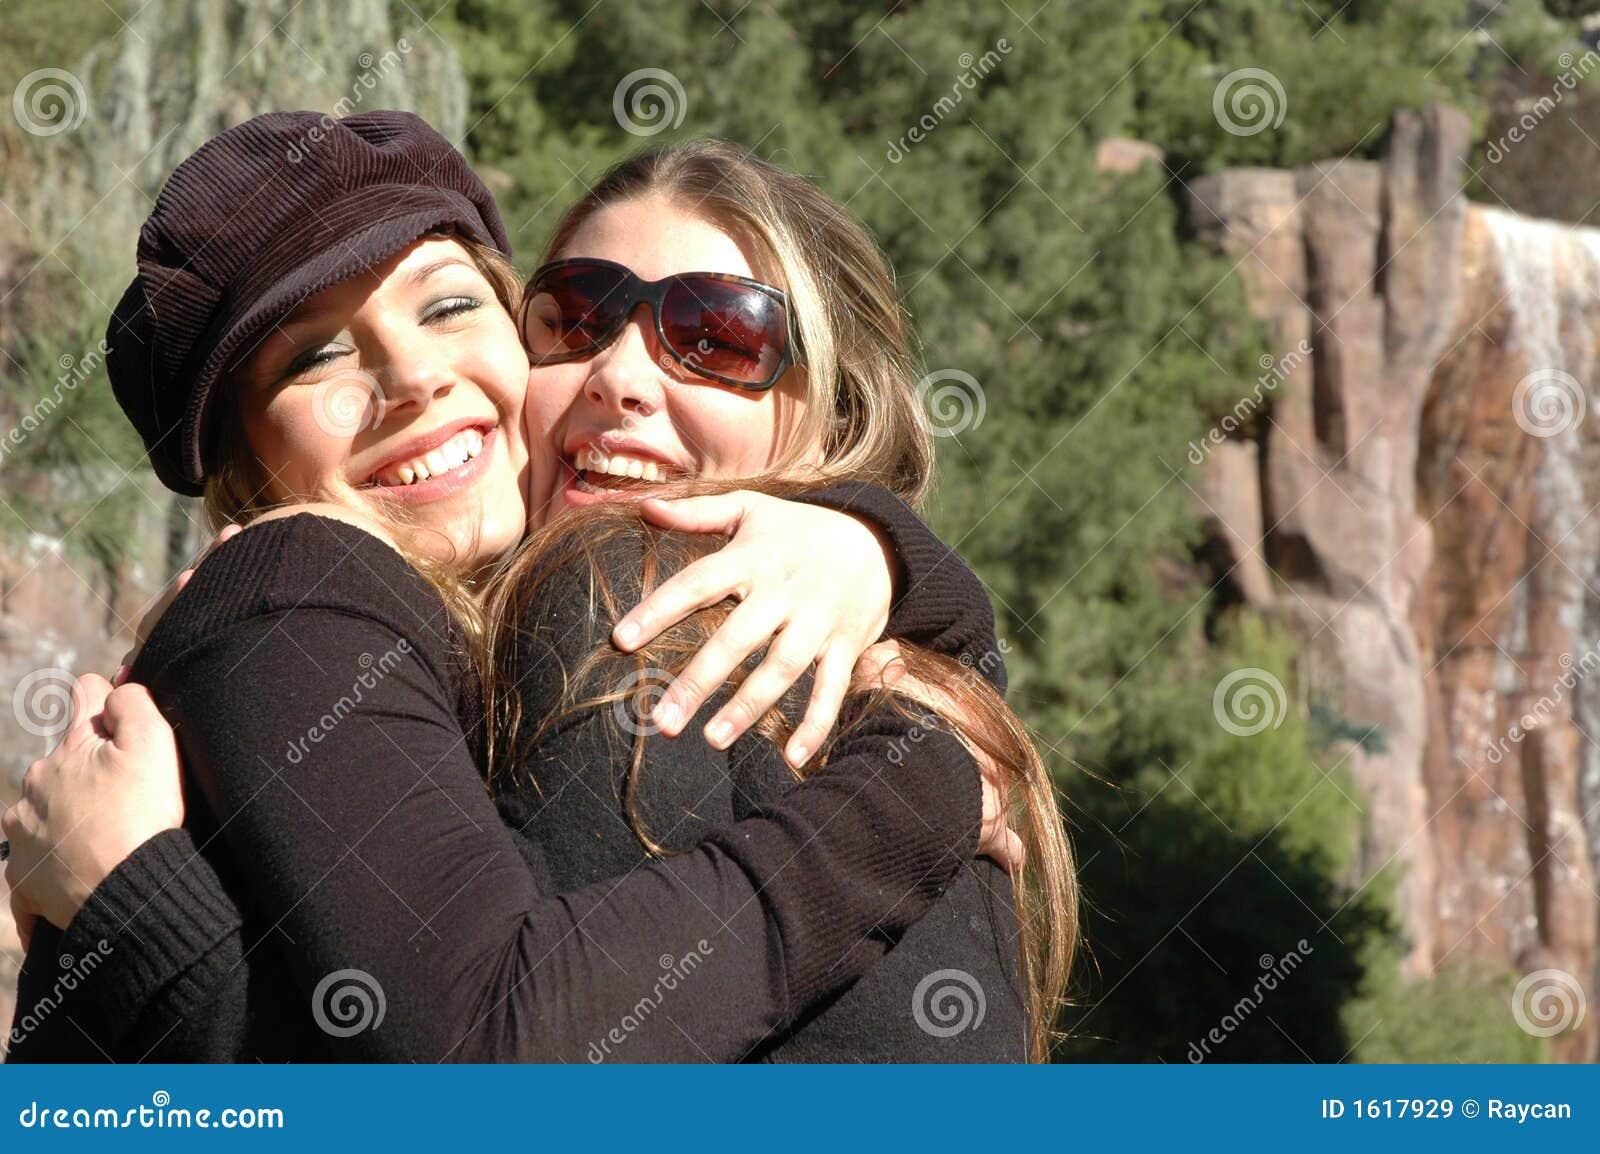 hug me royalty free stock images   image 1617929